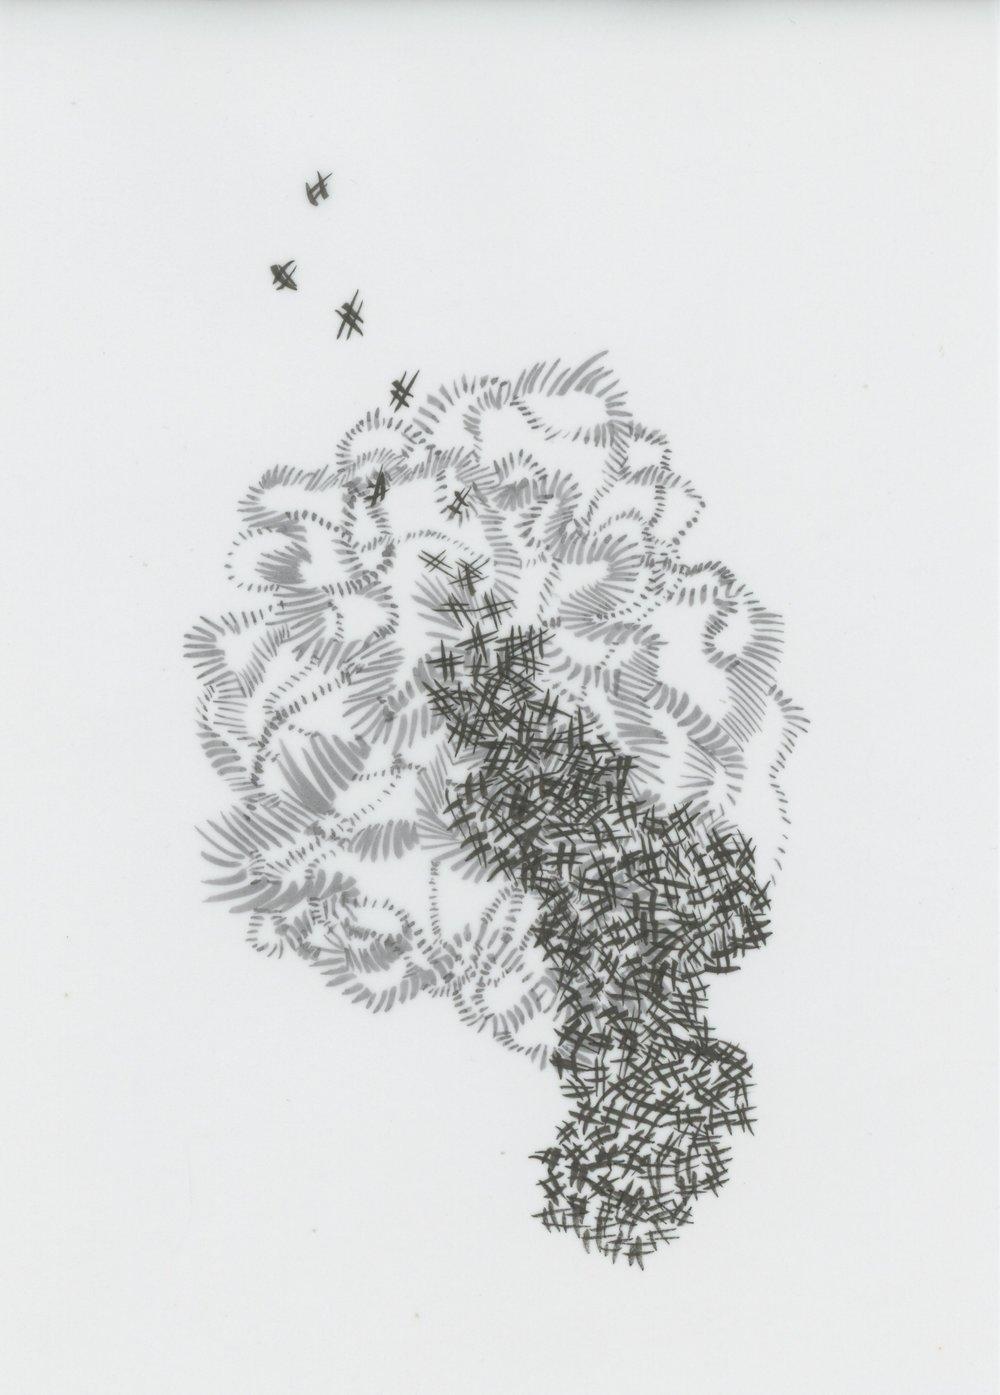 051318.132.Charlotte Gainsbourgtiff.jpg